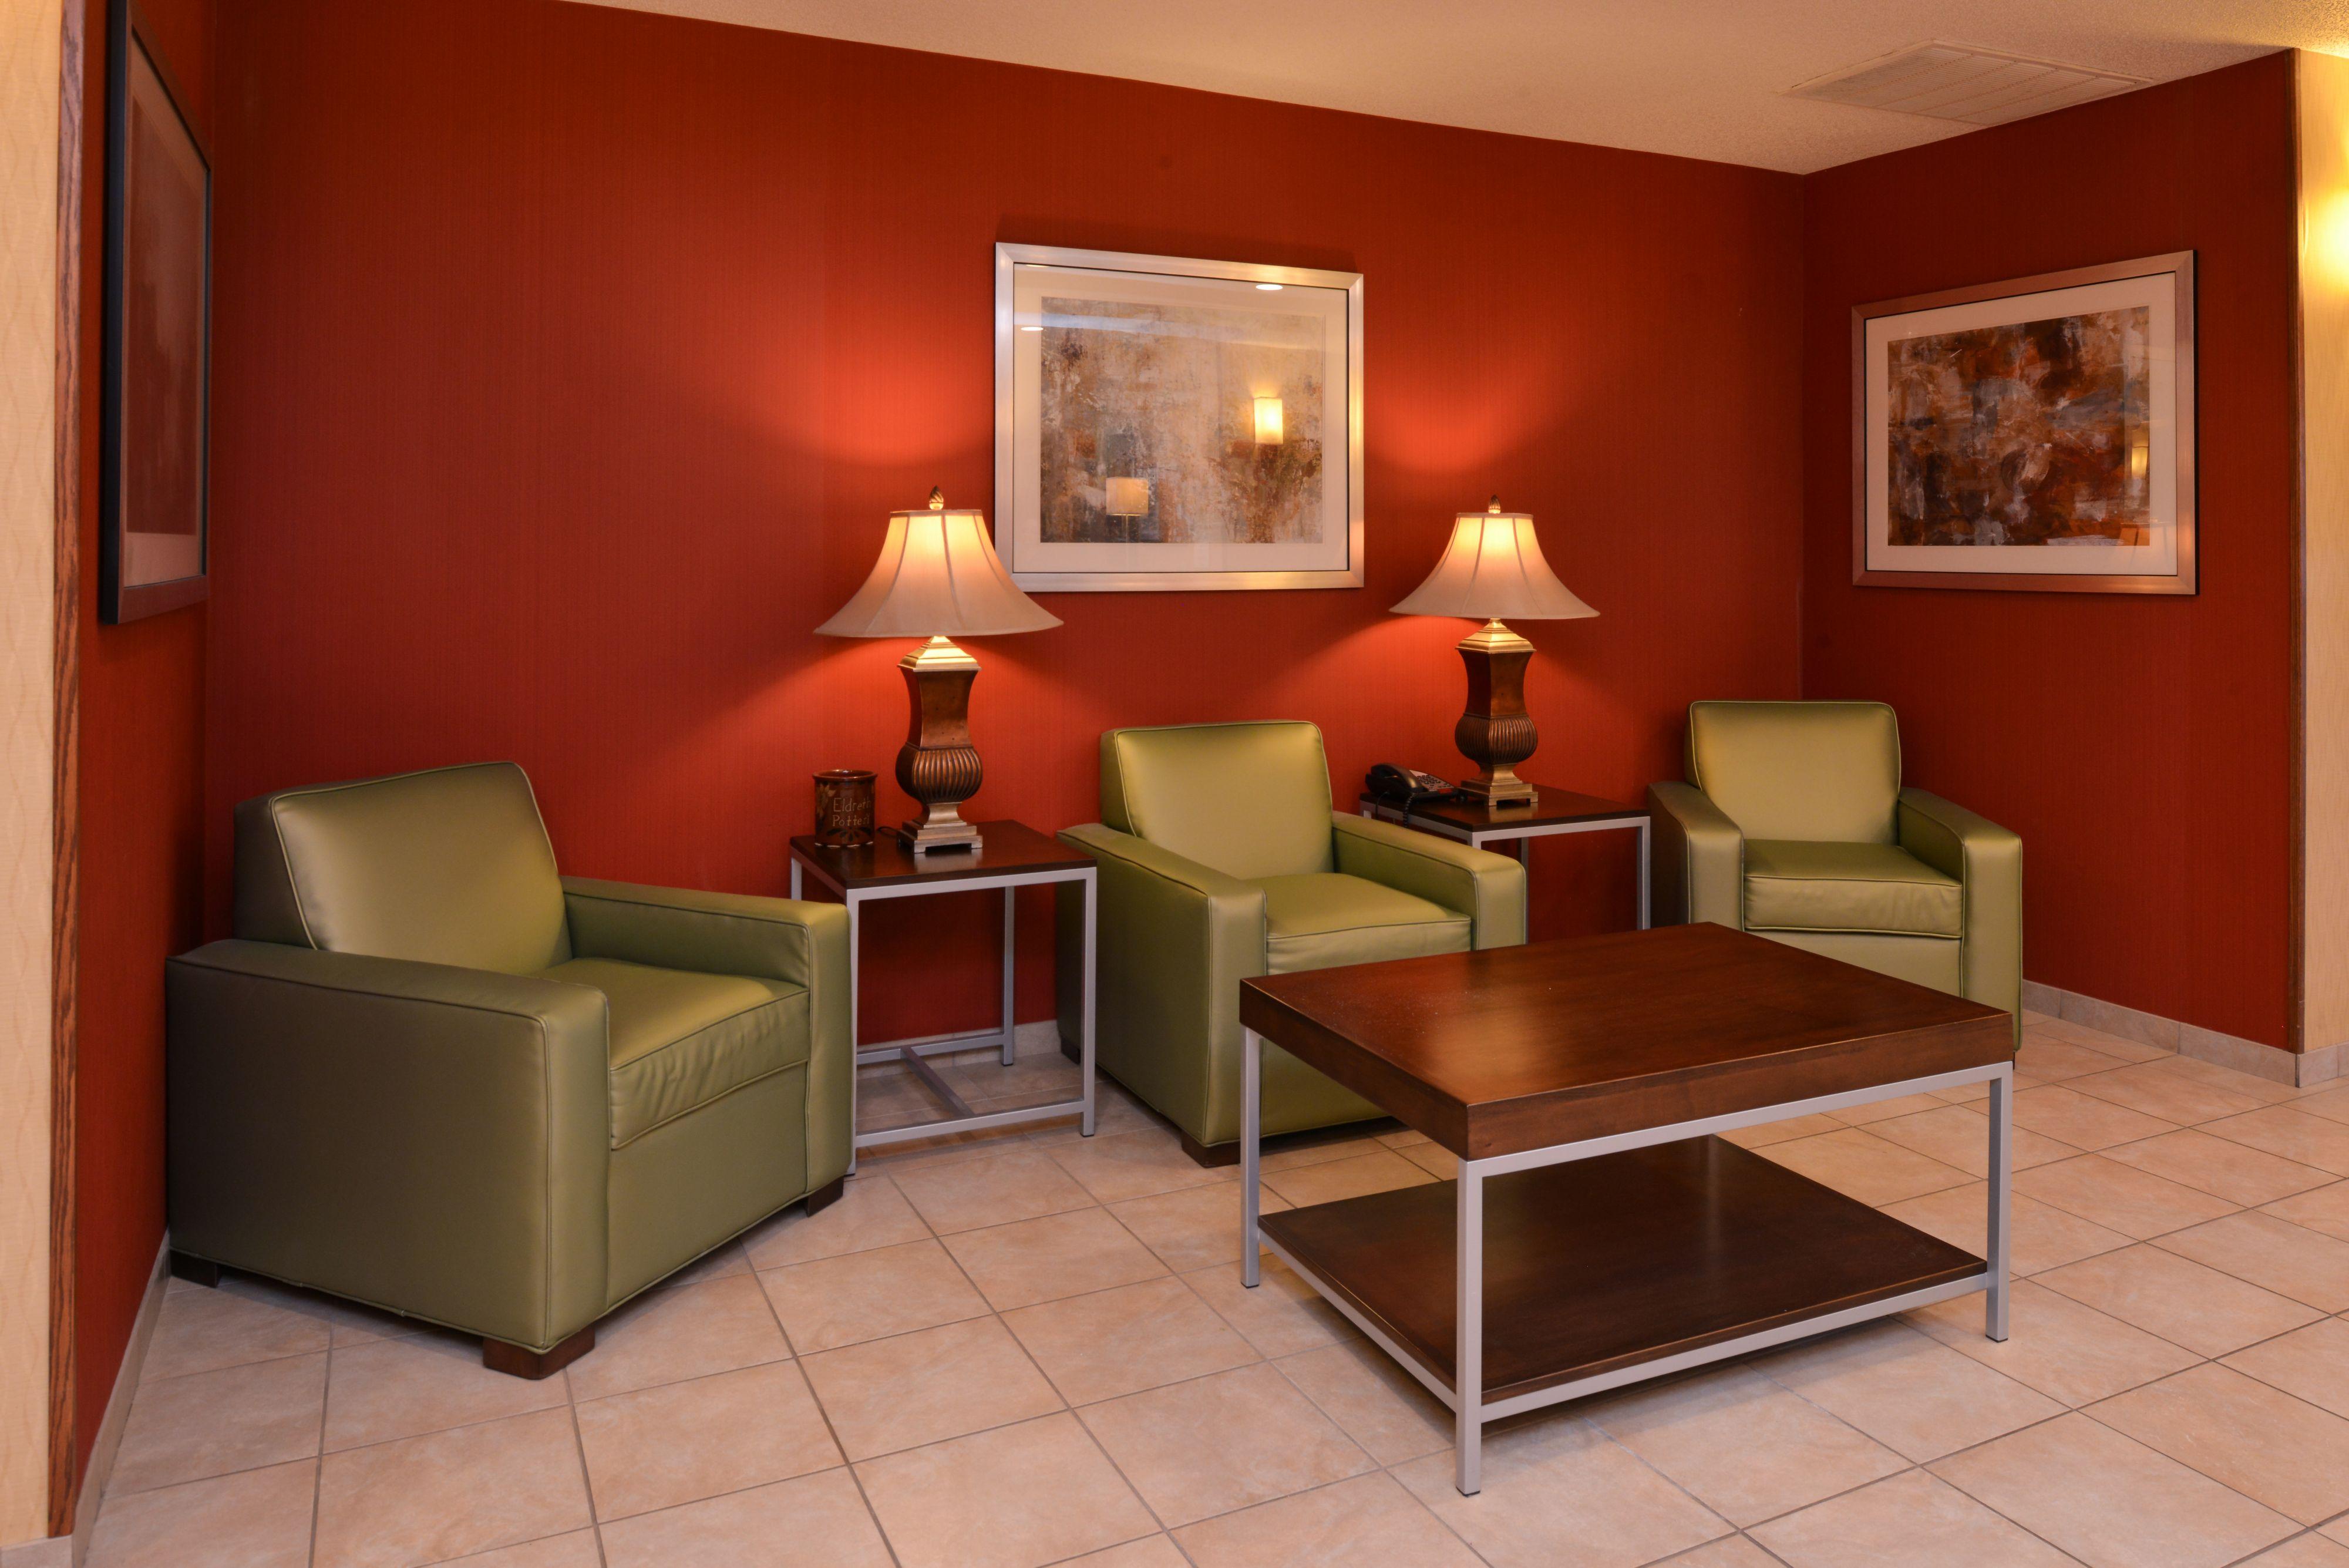 Holiday Inn Express & Suites Lancaster-Lititz image 3